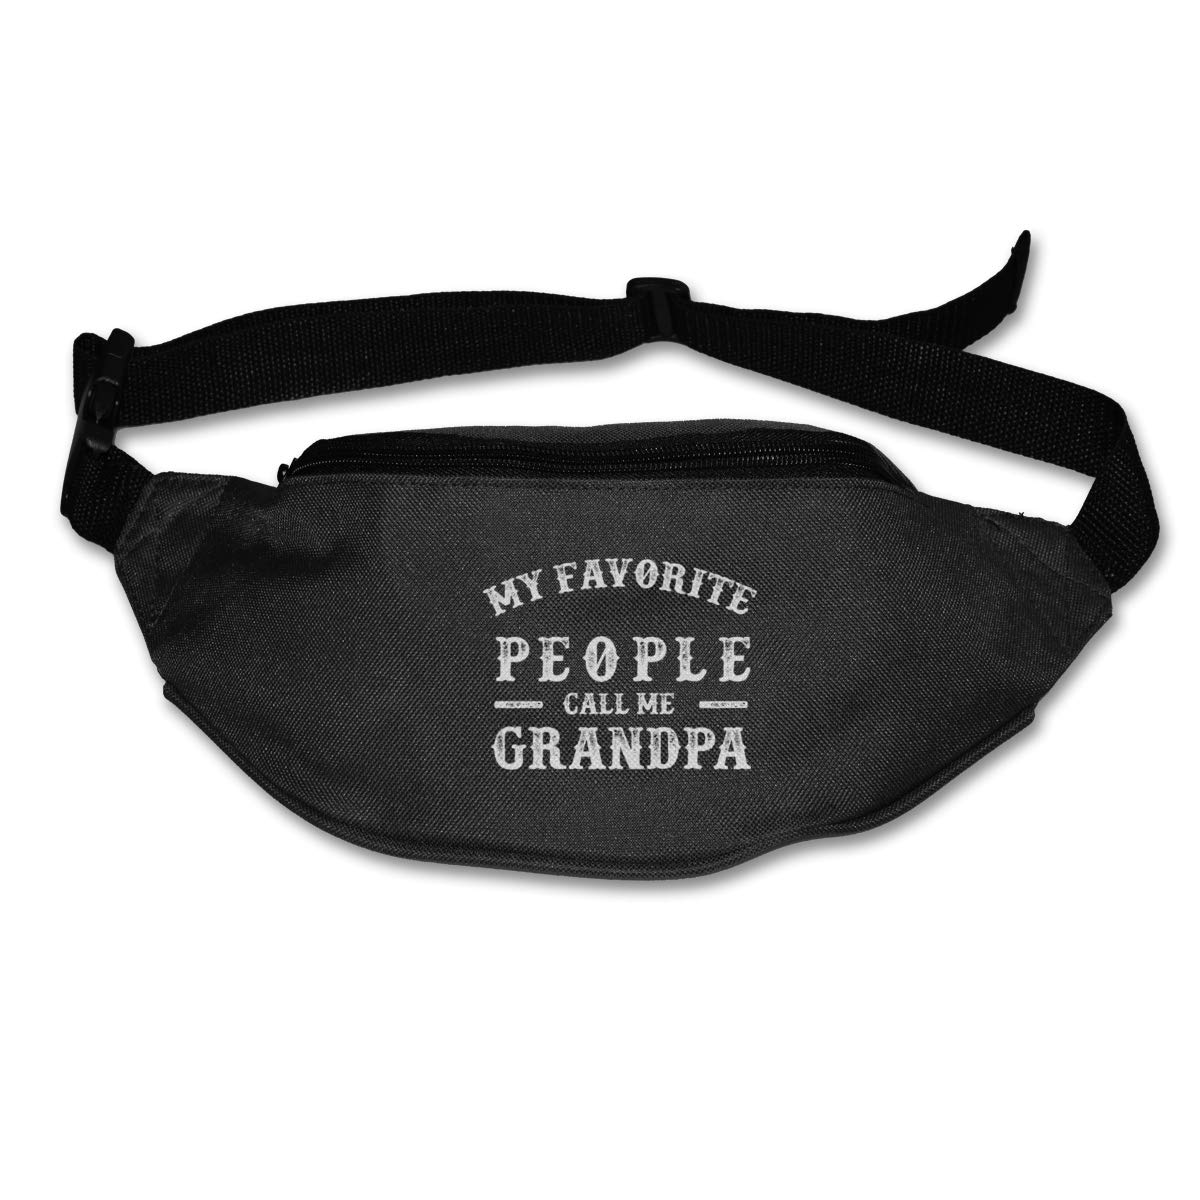 My Favorite People Call Me Grandpa Sport Waist Bag Fanny Pack Adjustable For Run